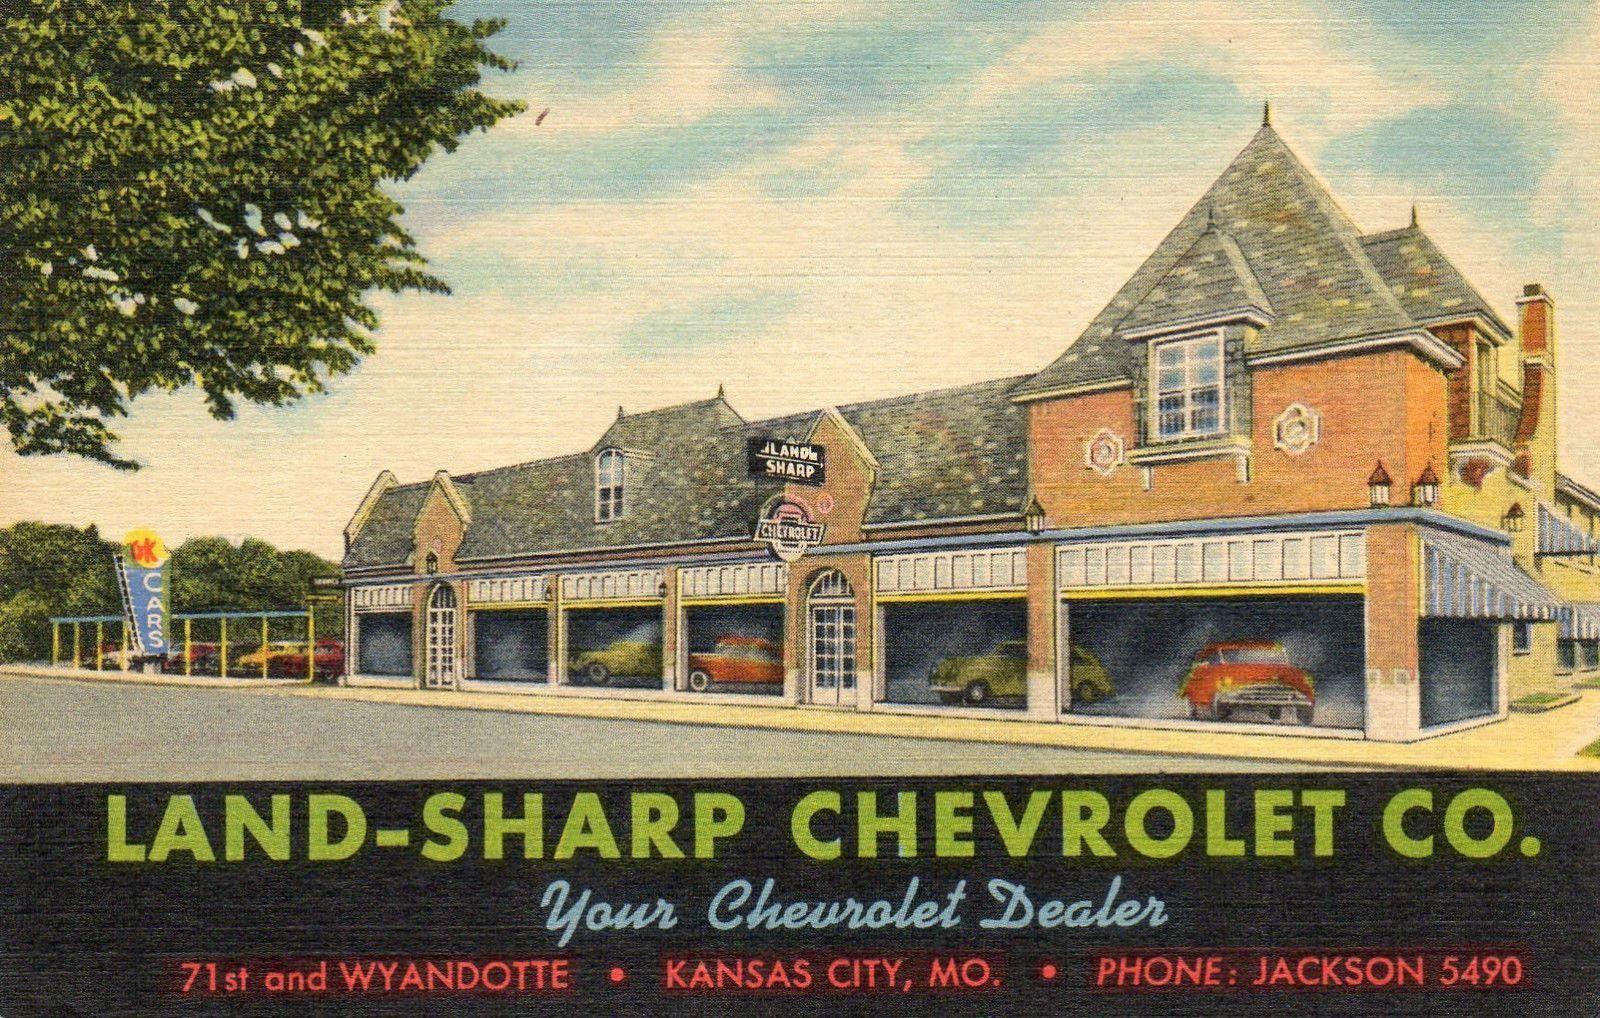 Land Sharp Chevrolet Co Dealership Kansas City Missouri Kansas City Kansas City Missouri Car Dealership